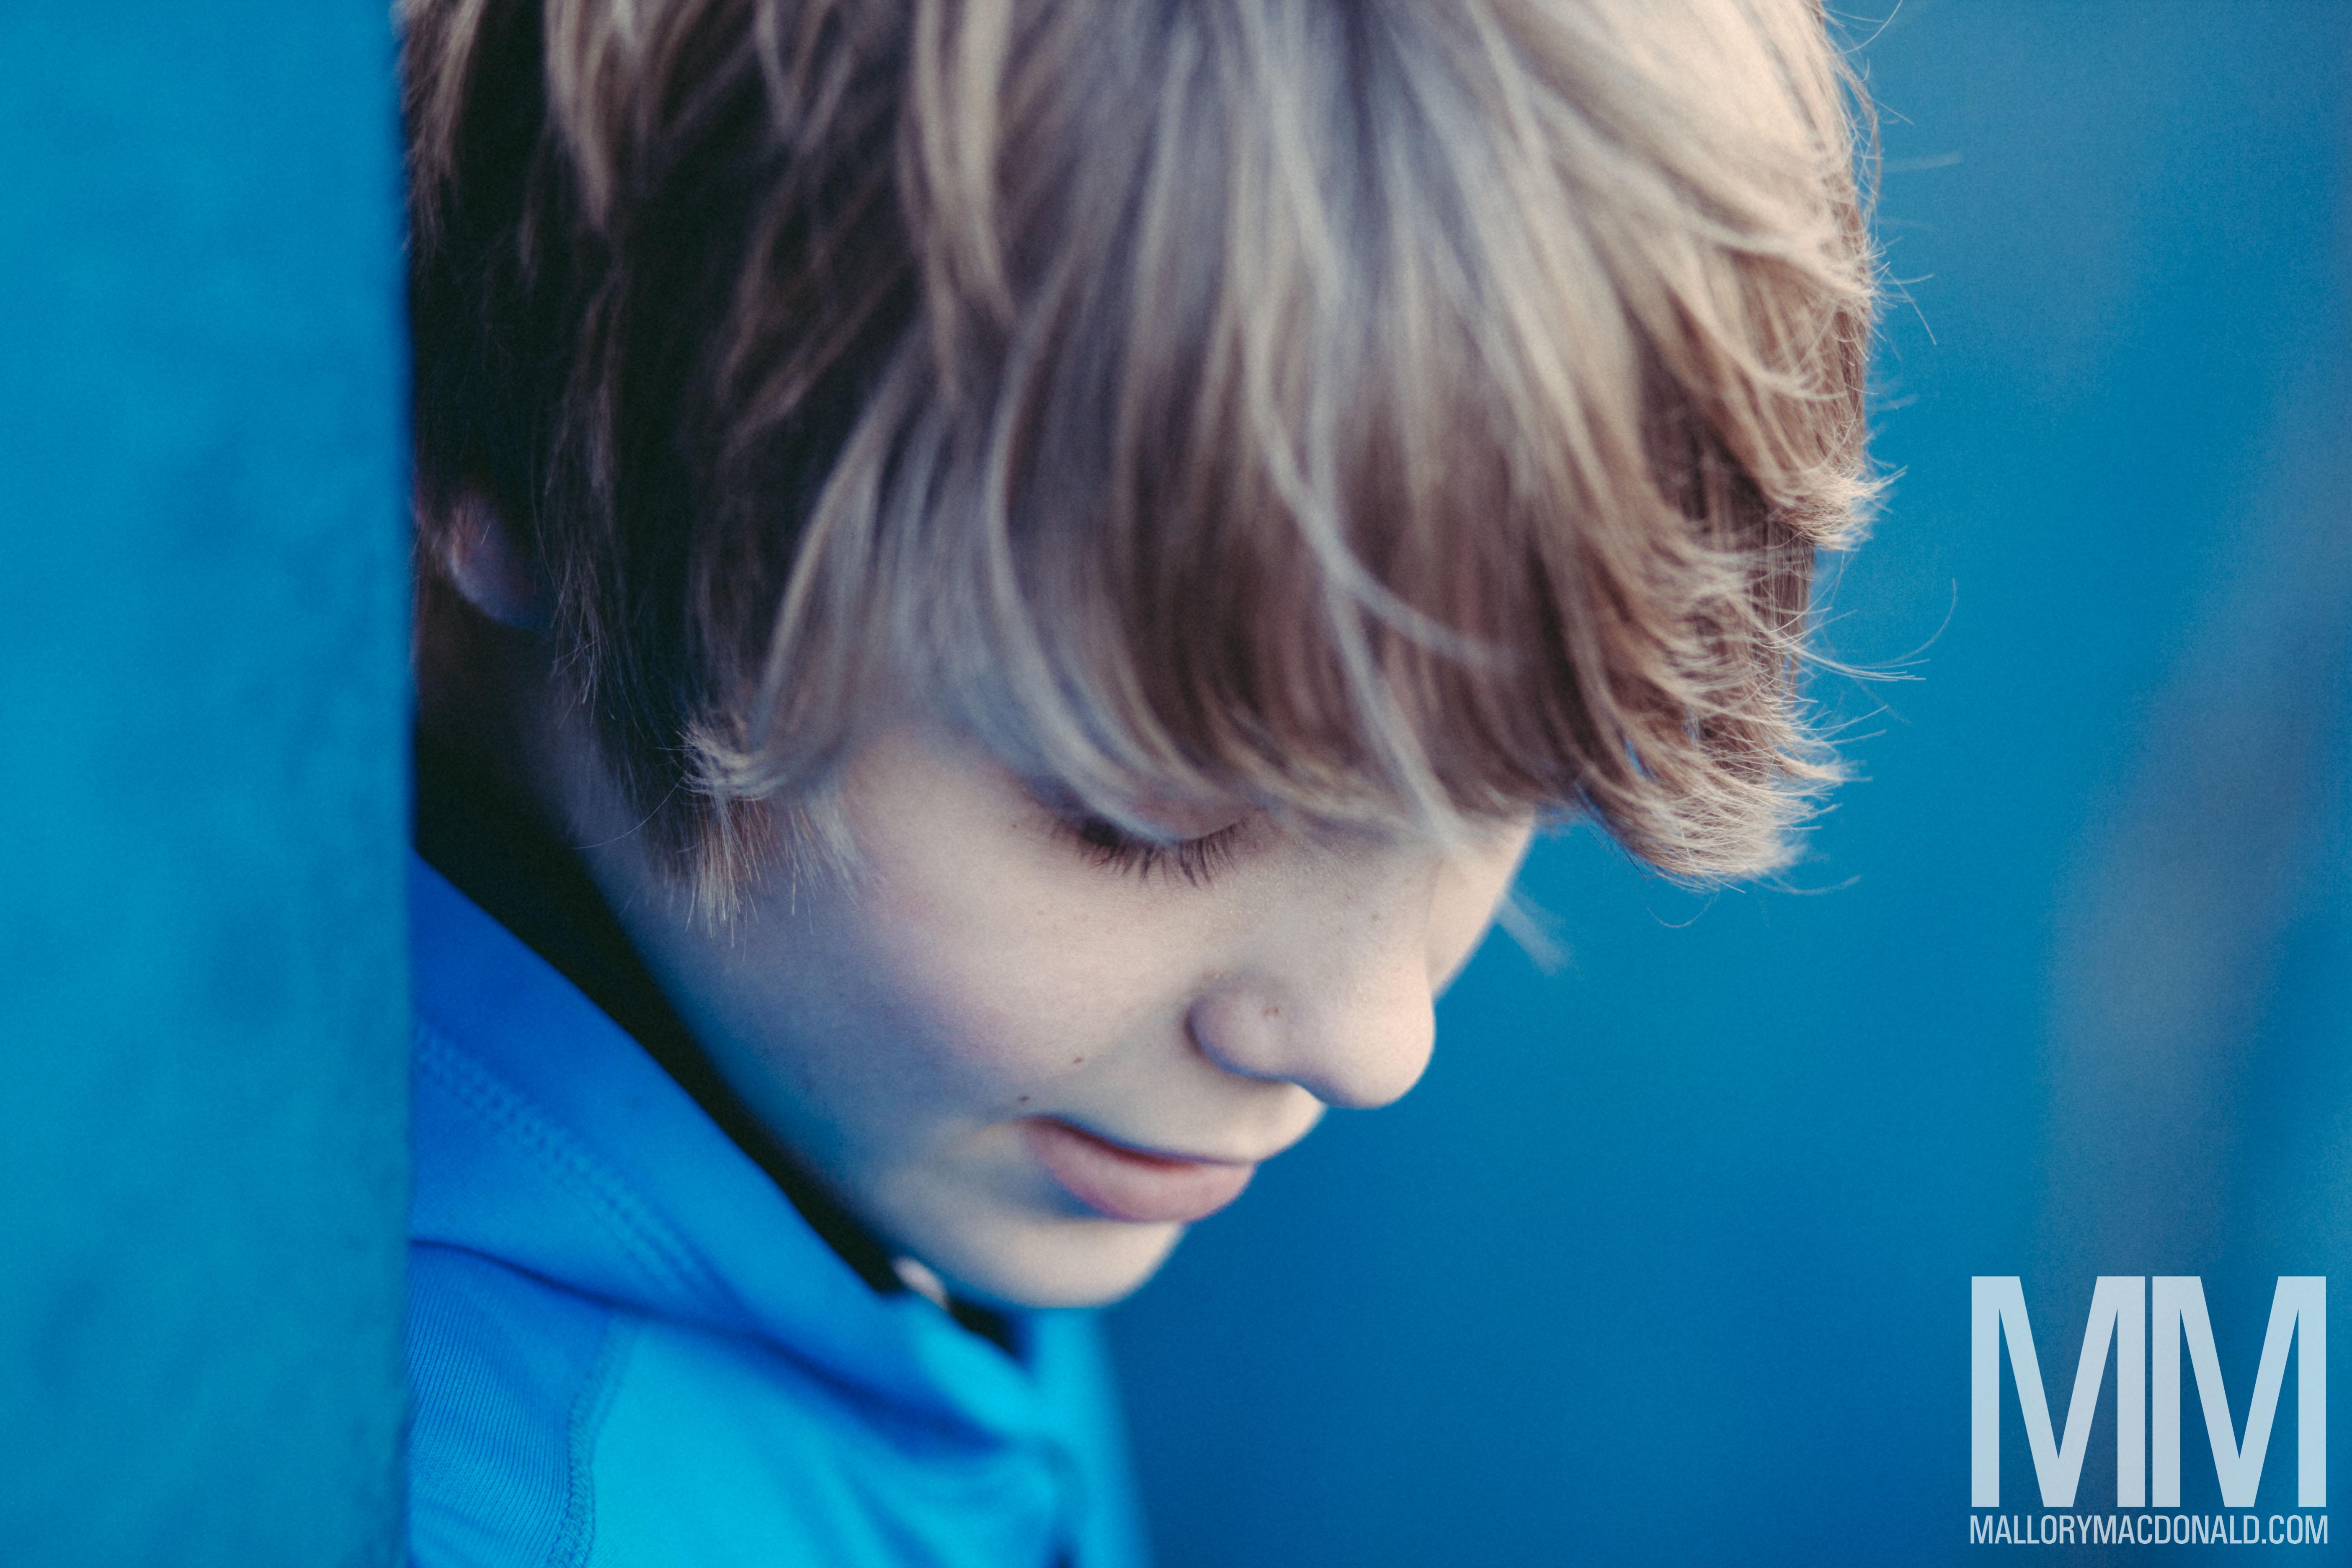 seattle childrens photographer-mallory macdonald-london childrens photographer-7268